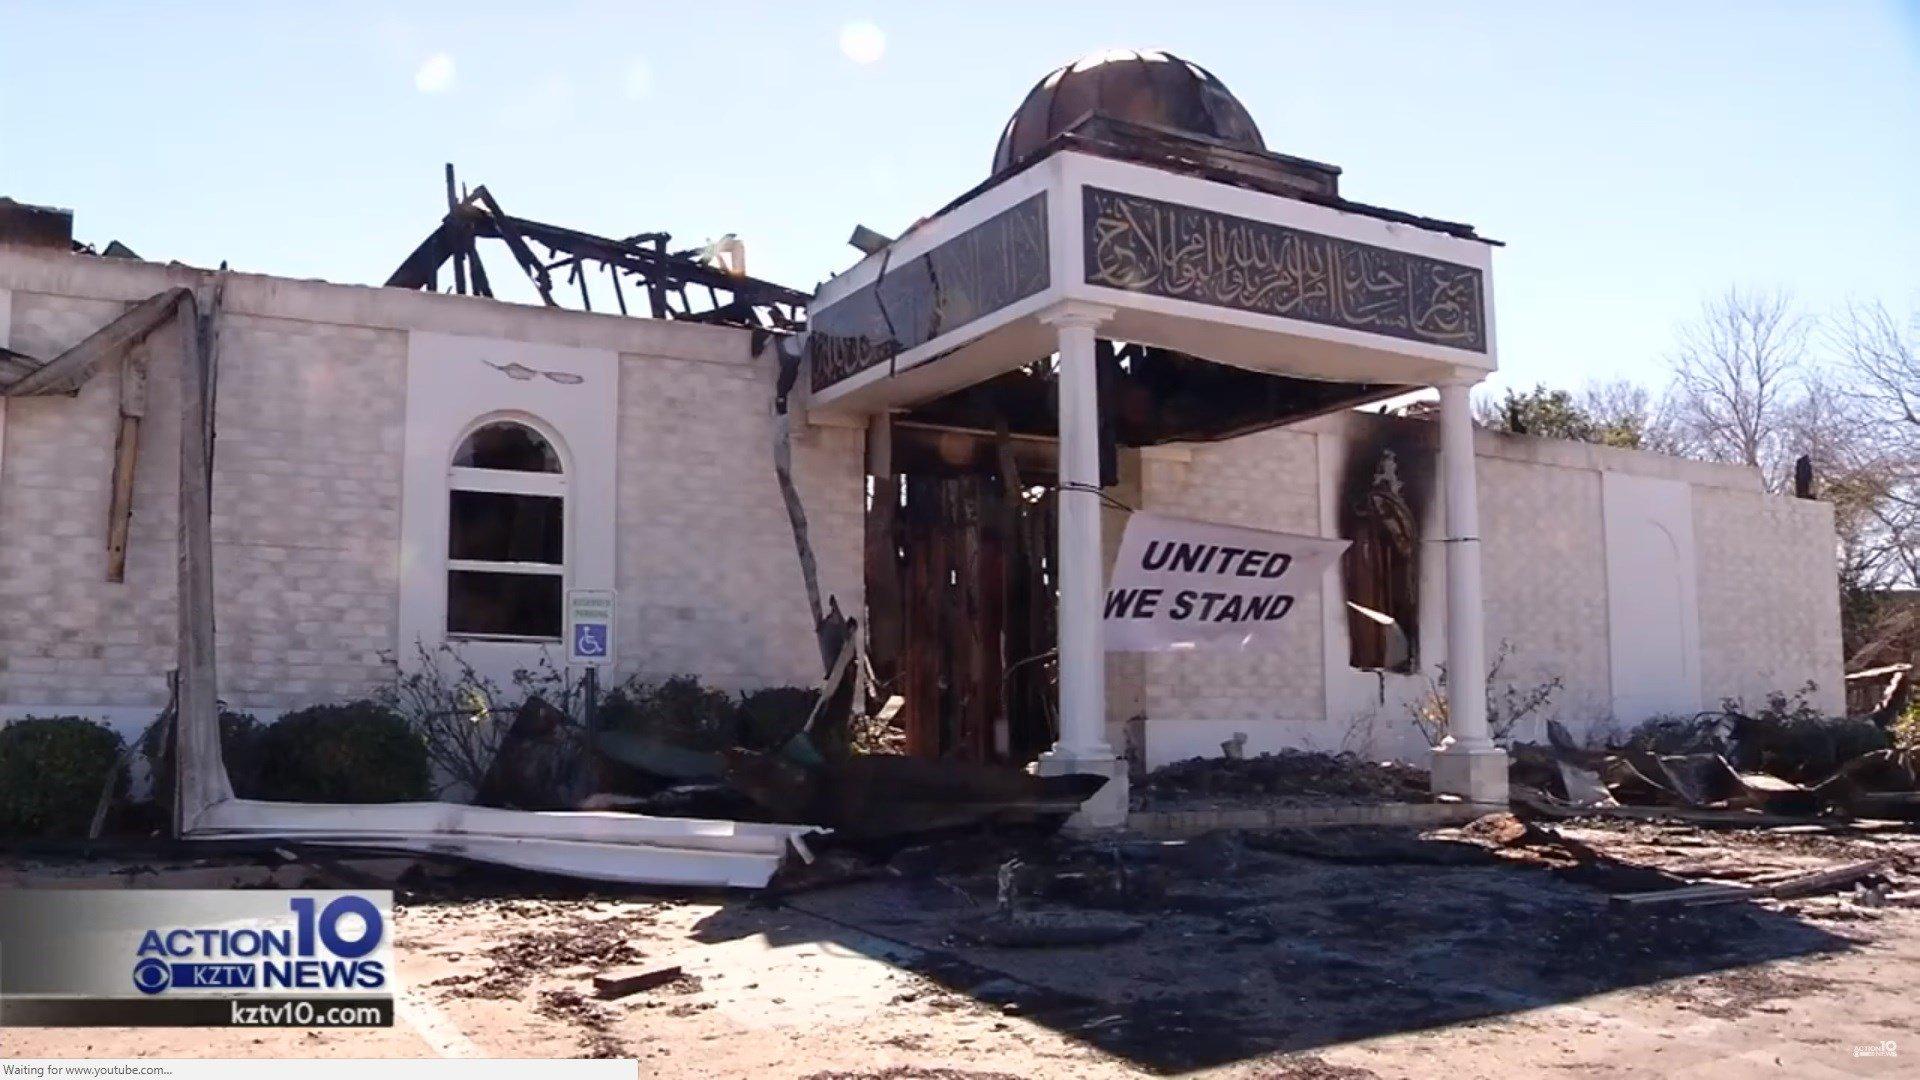 Victoria Islamic Center was set on fire on Jan. 28, 2017